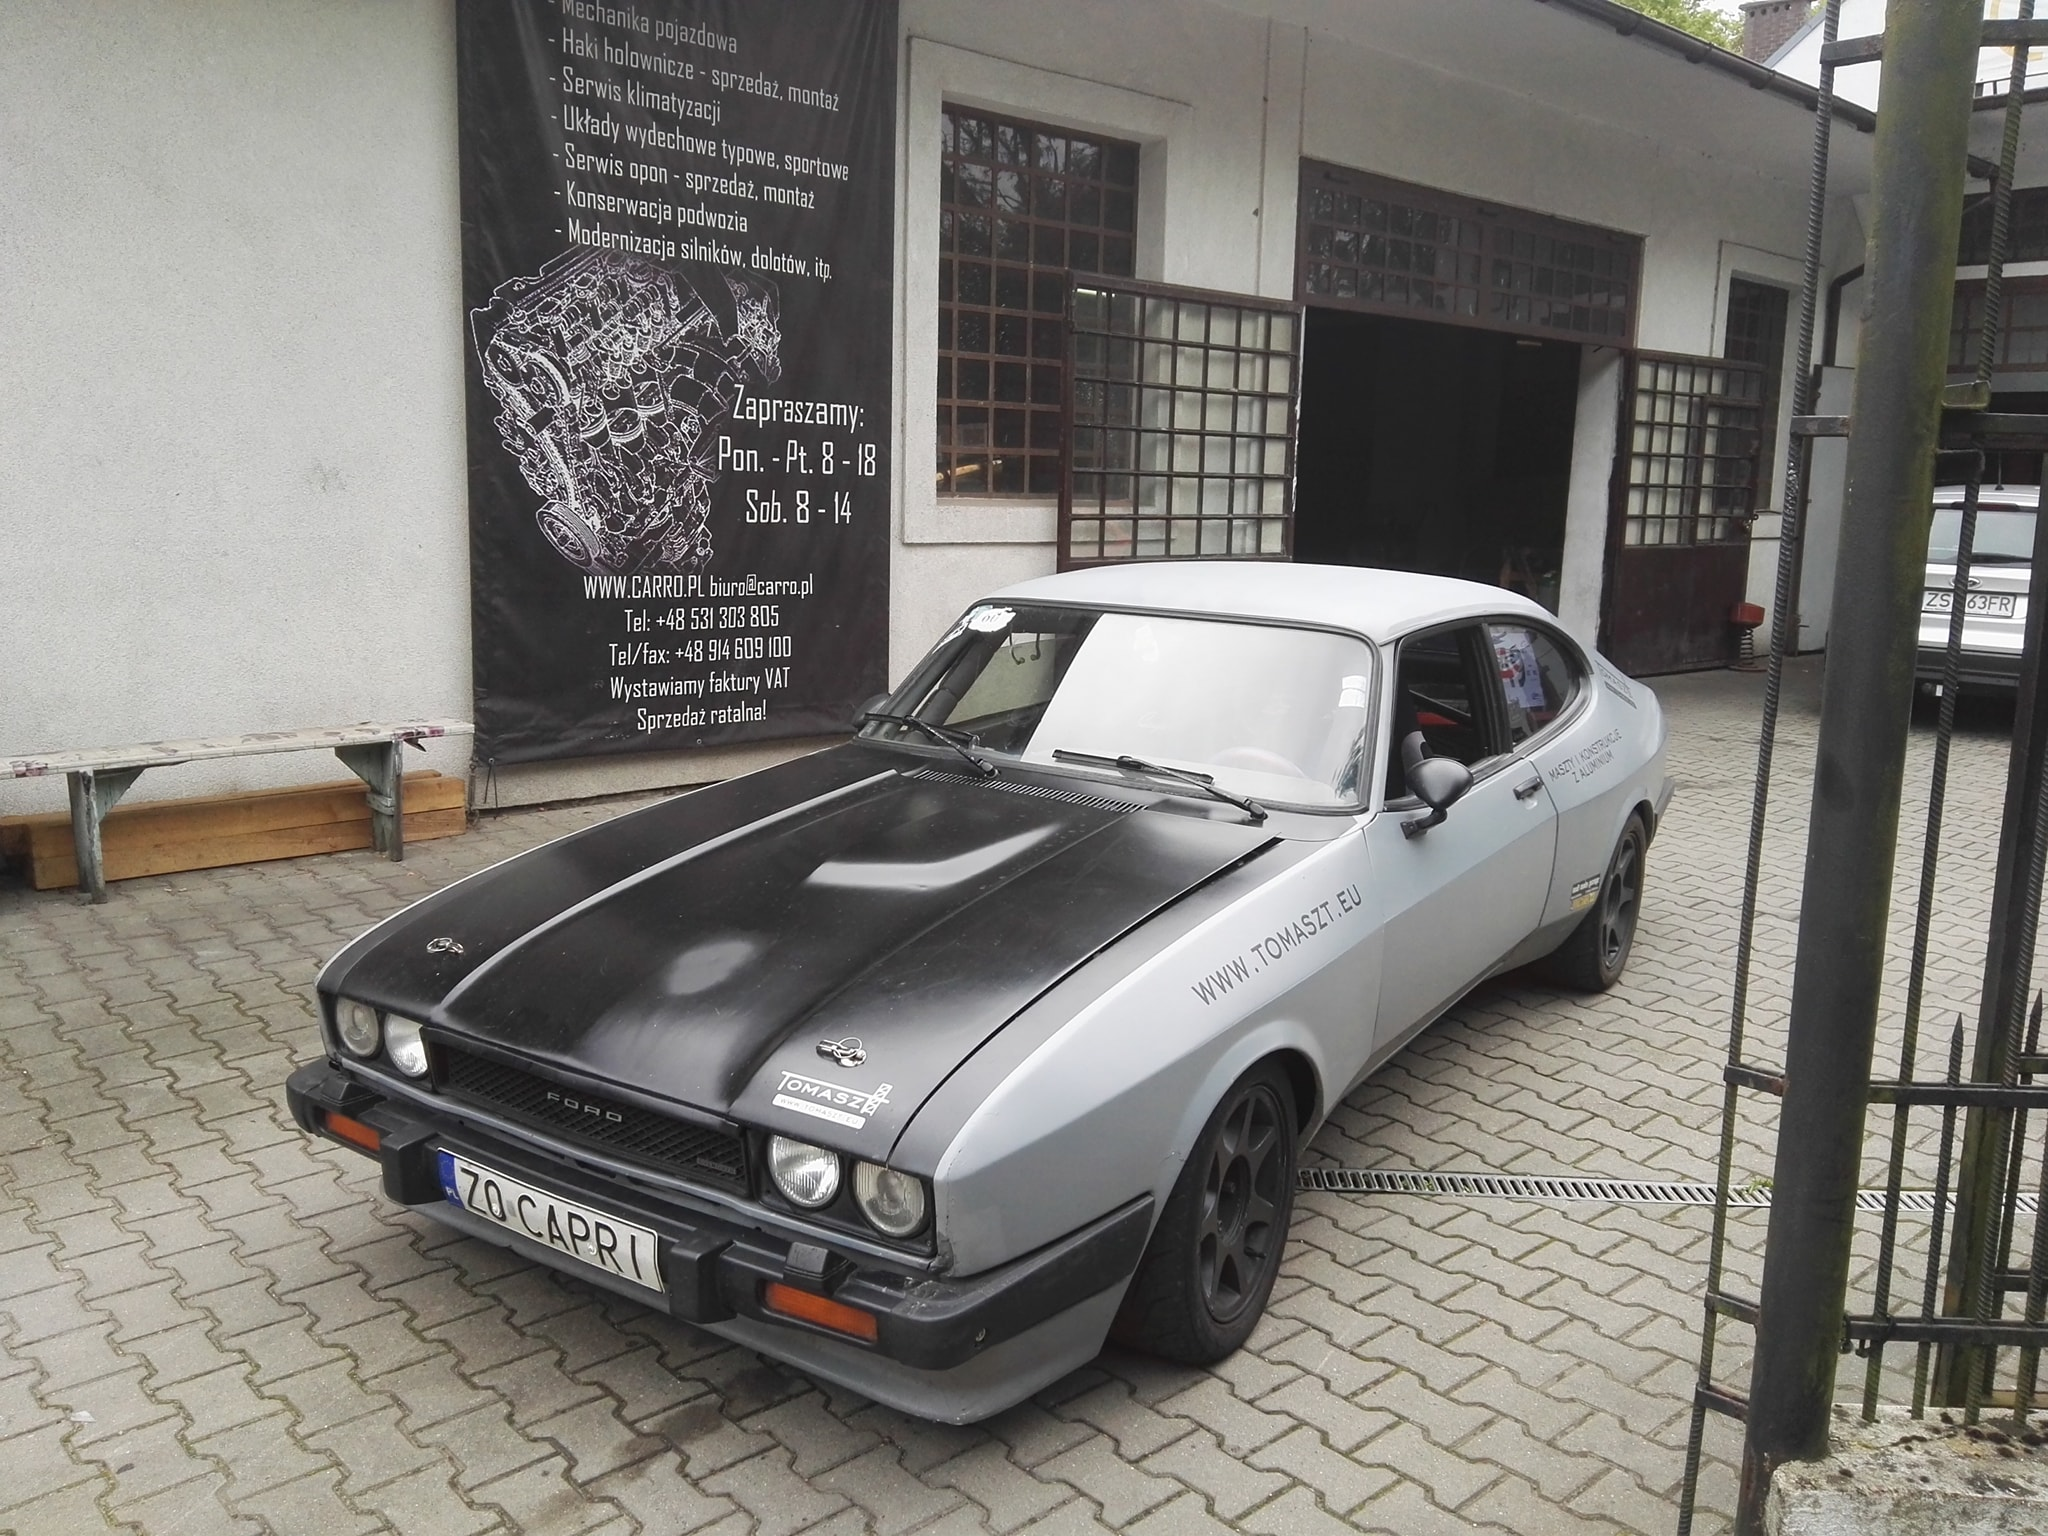 Ford Capri Mk3 with a Turbo Cosworth V6